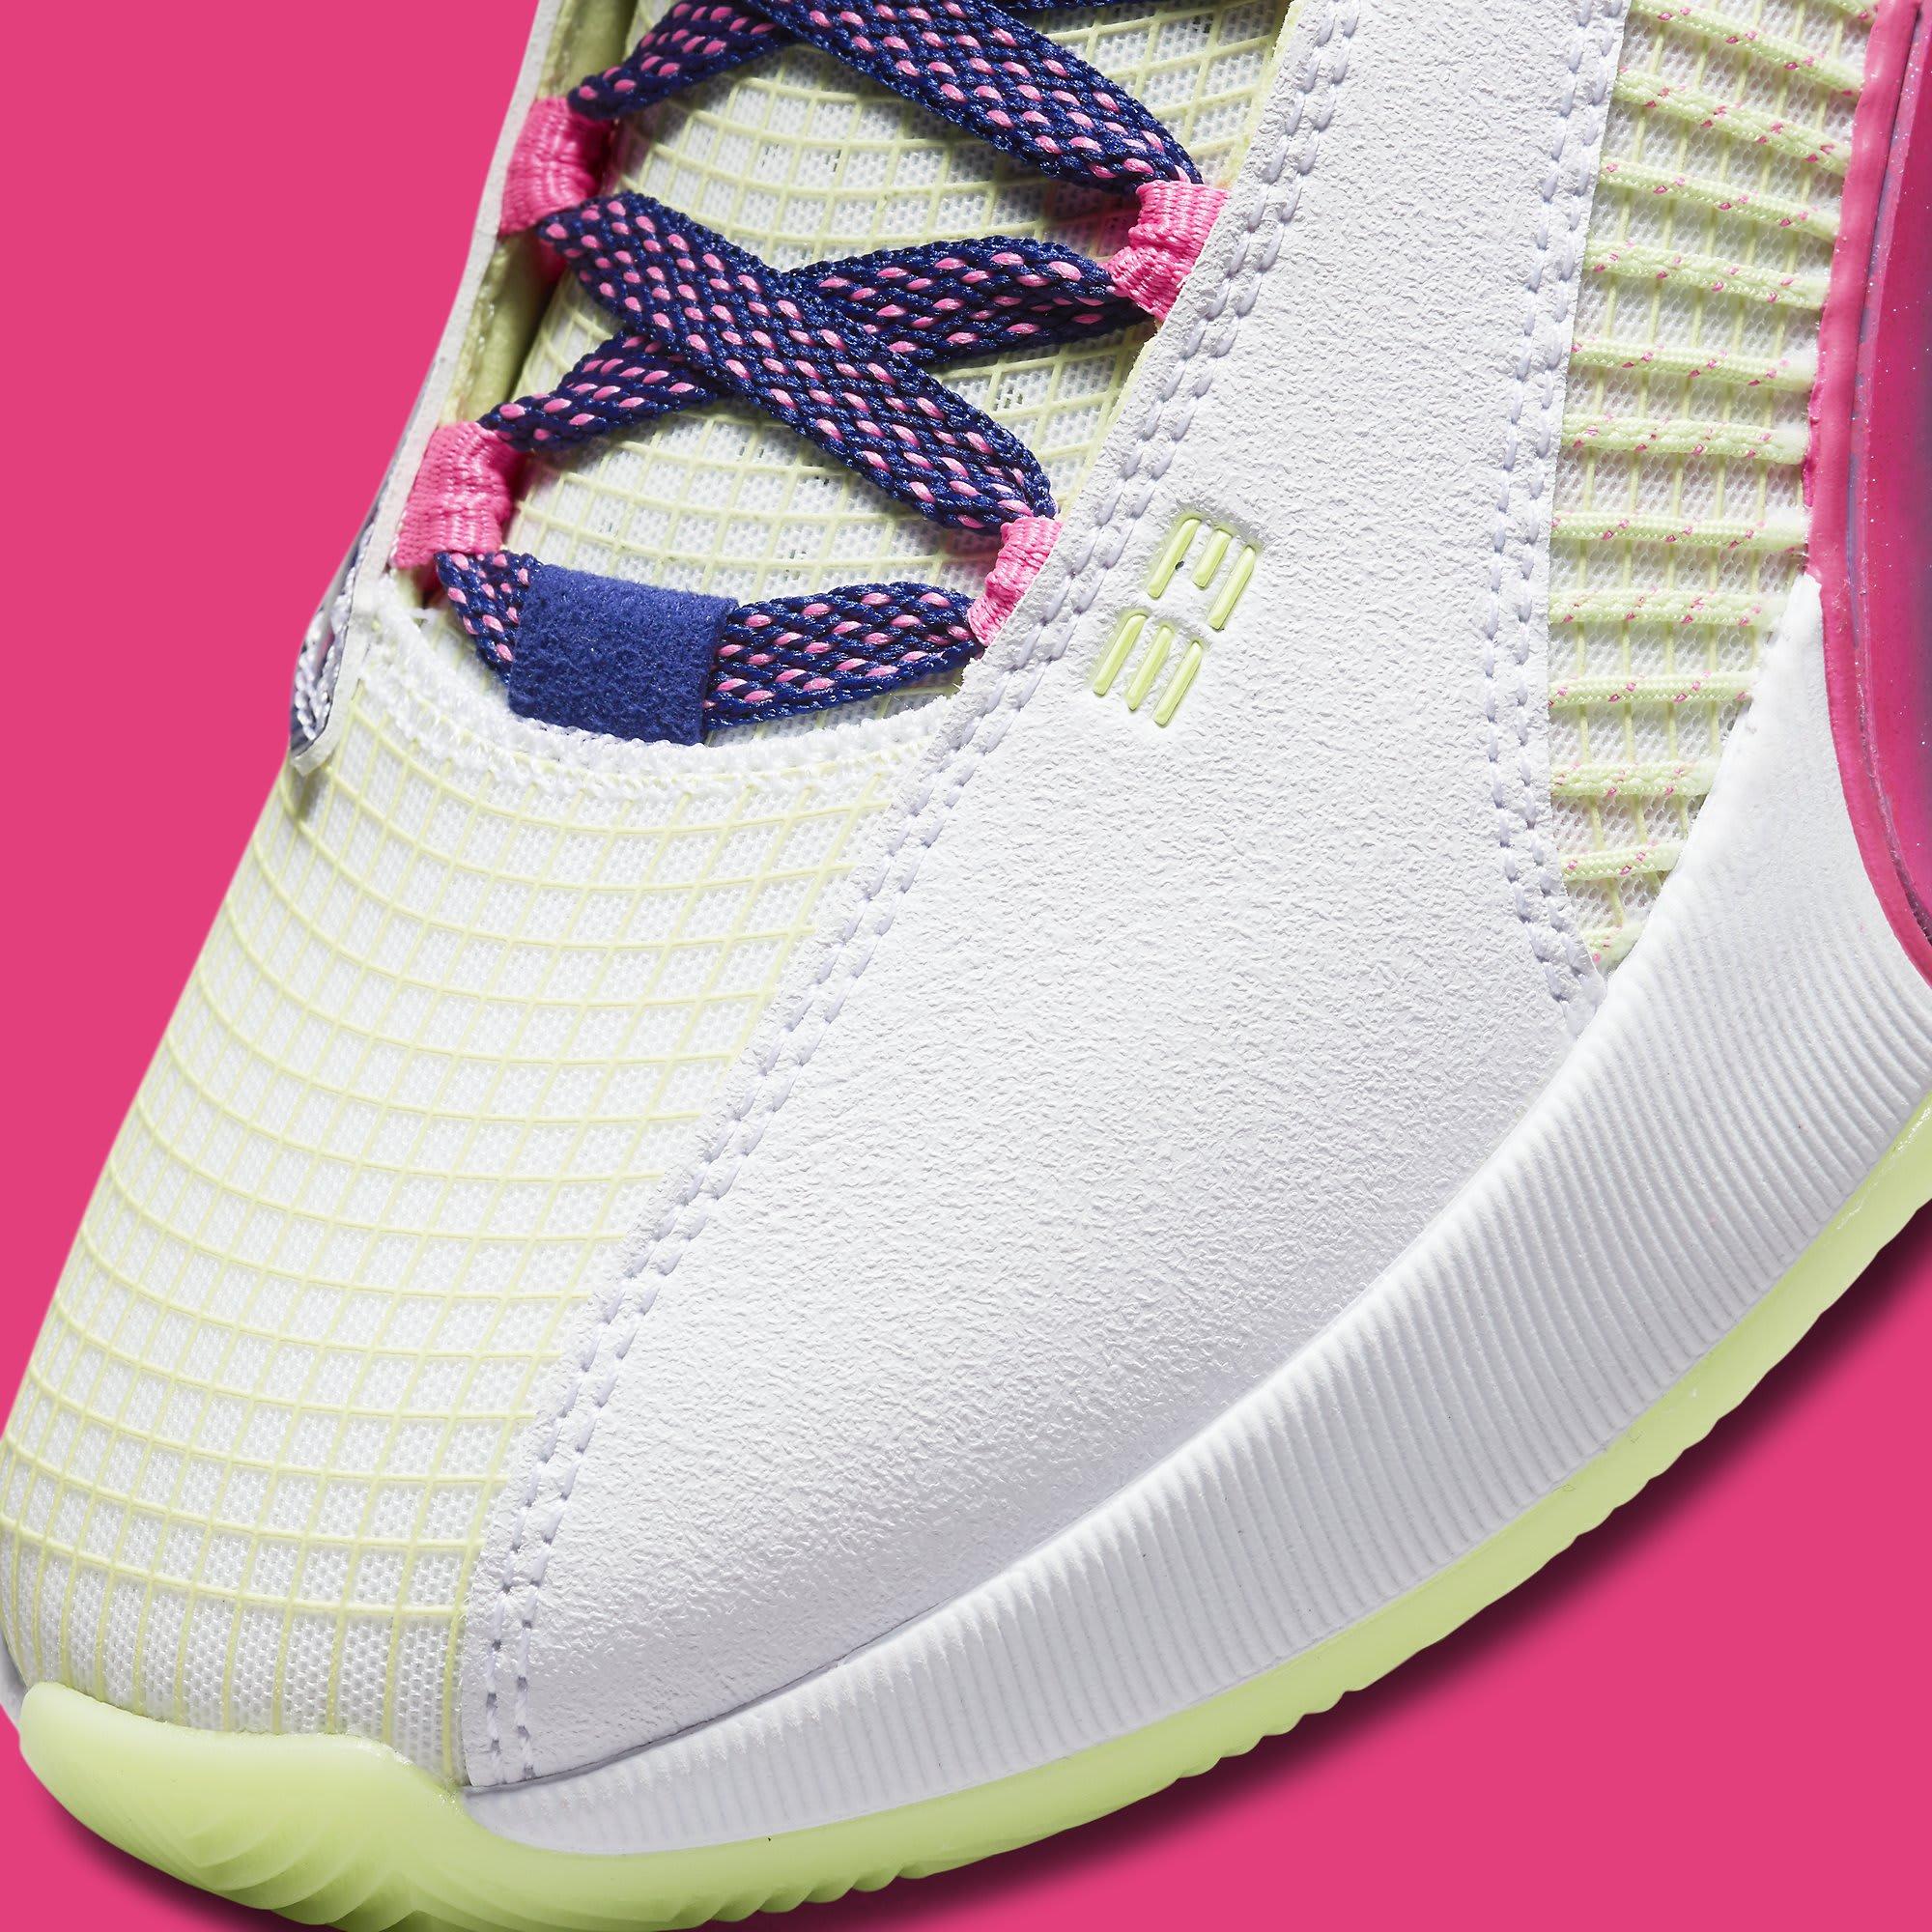 Air Jordan 35 XXXV Luke Doncic PE Release Date DJ9805-190 Toe Detail